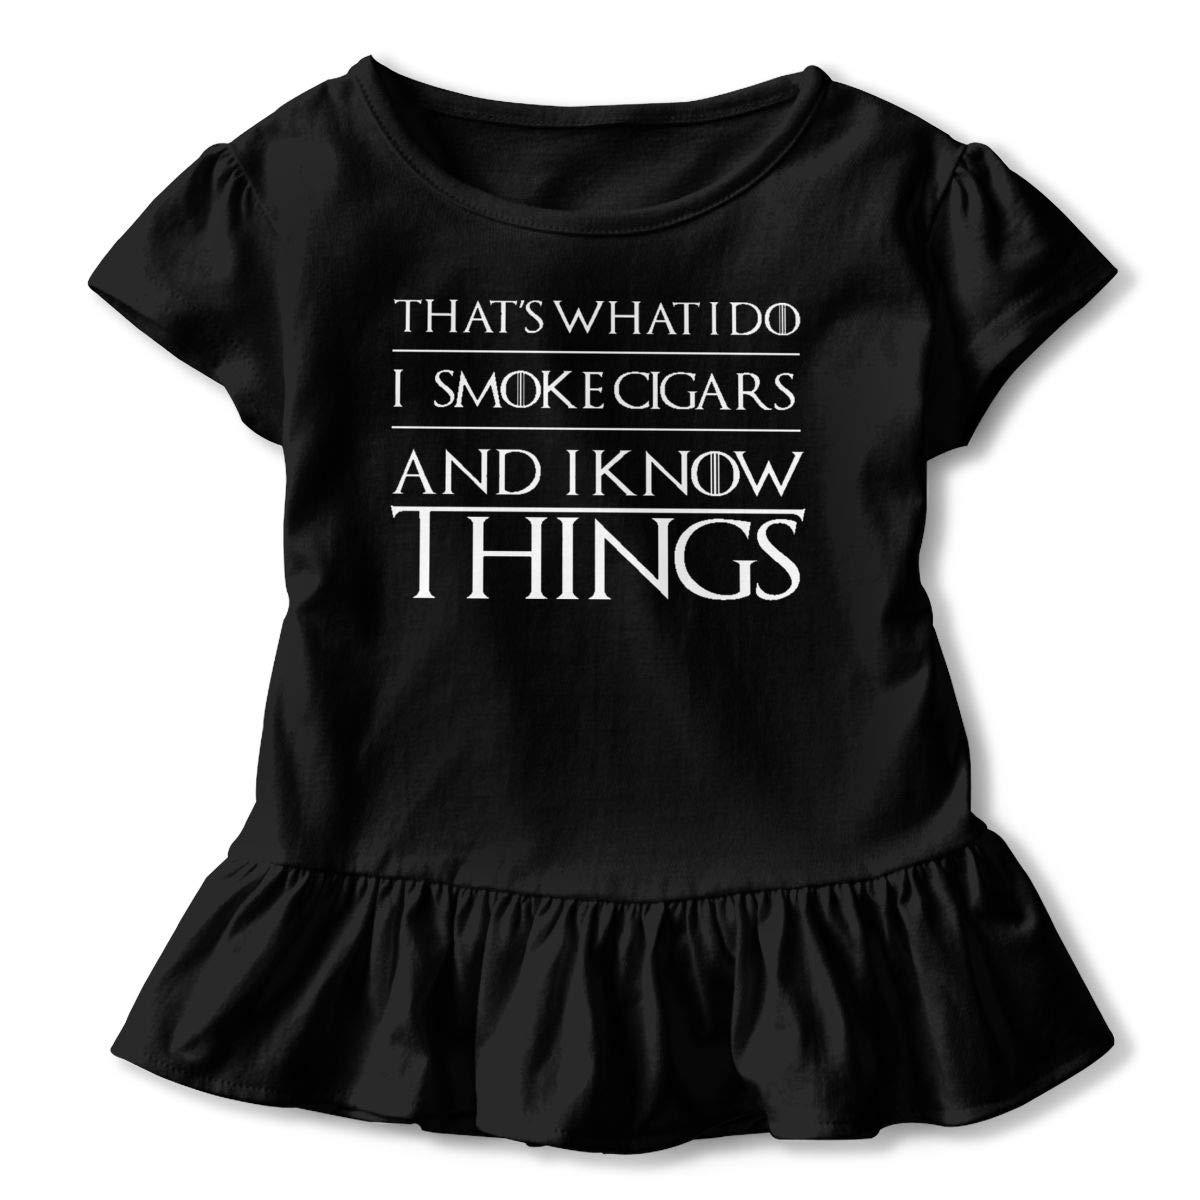 Thats What I Do I Smoke Cigars Popular T-Shirt Toddler Flounced T Shirts Soft Graphic T-Shirt for 2-6T Kids Girls